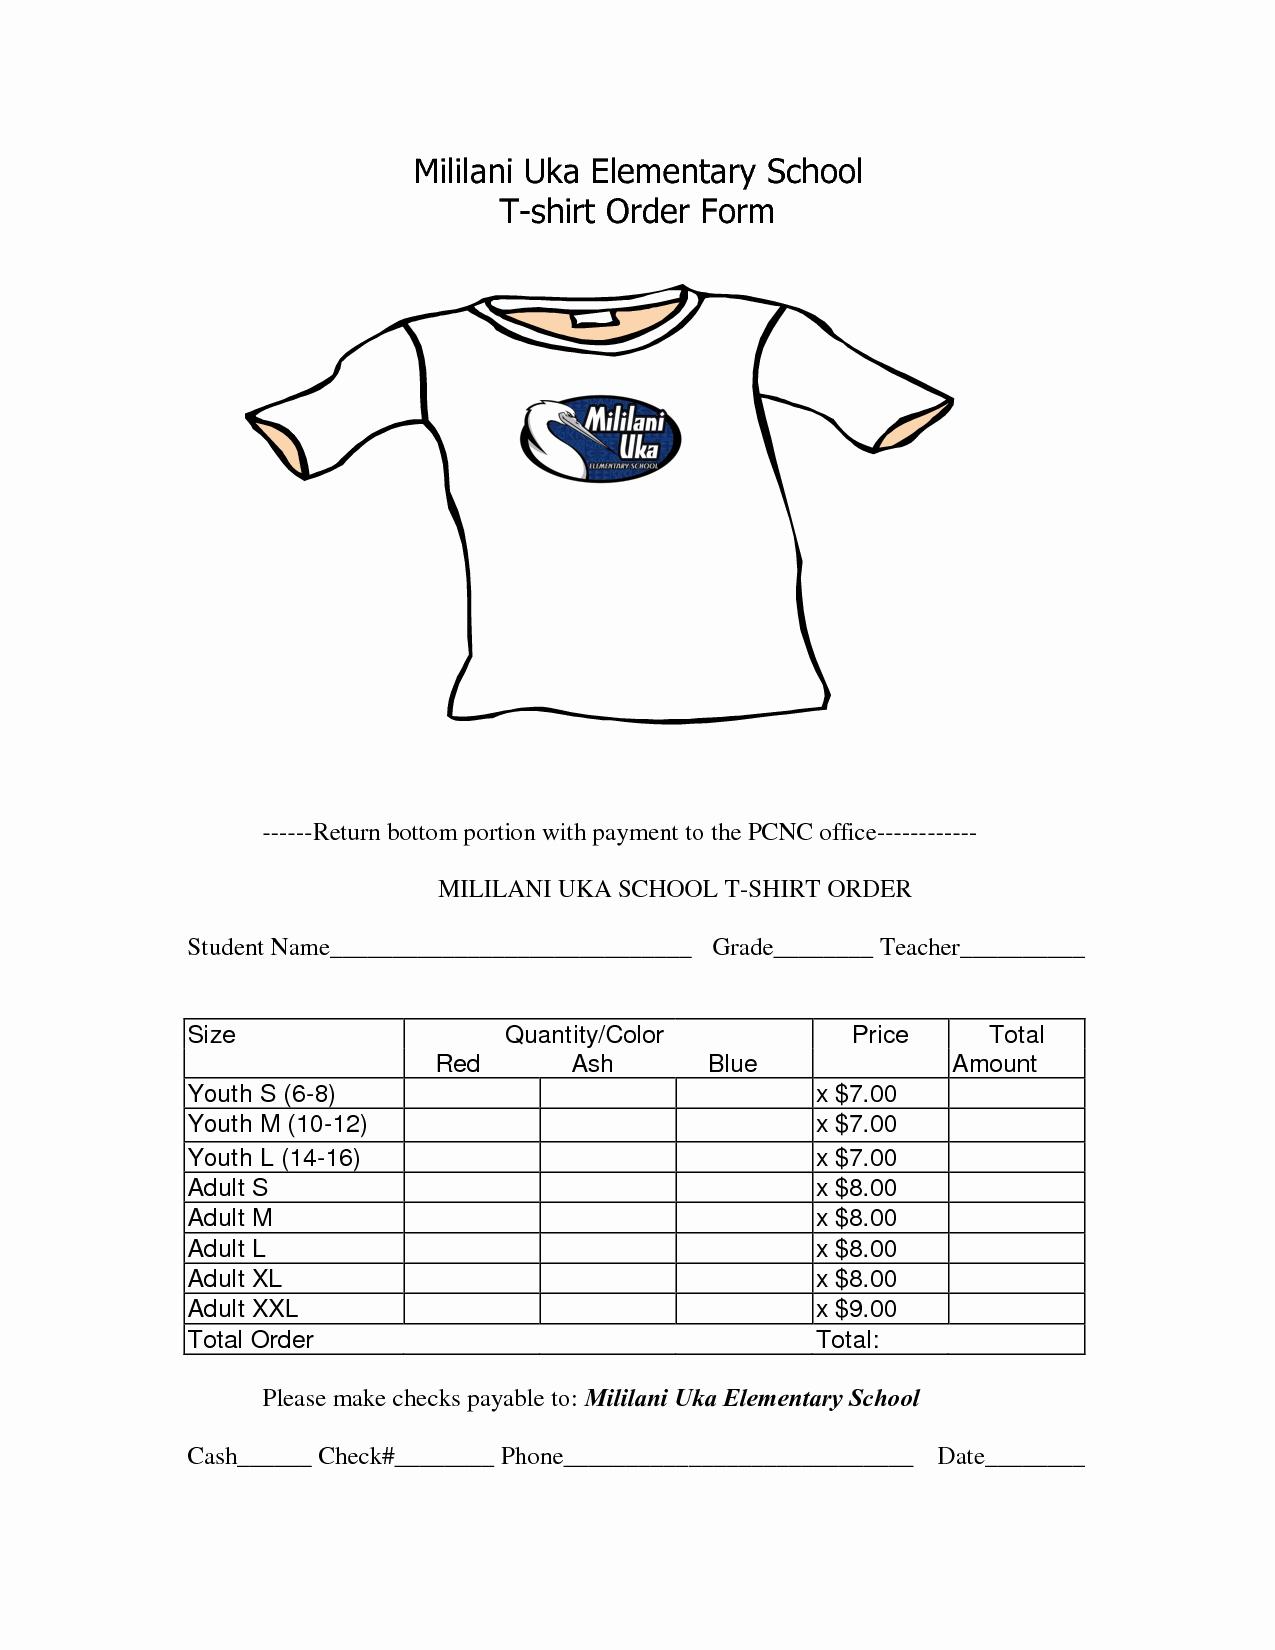 Tshirt order form Template Inspirational School T Shirt order form Template Clothes